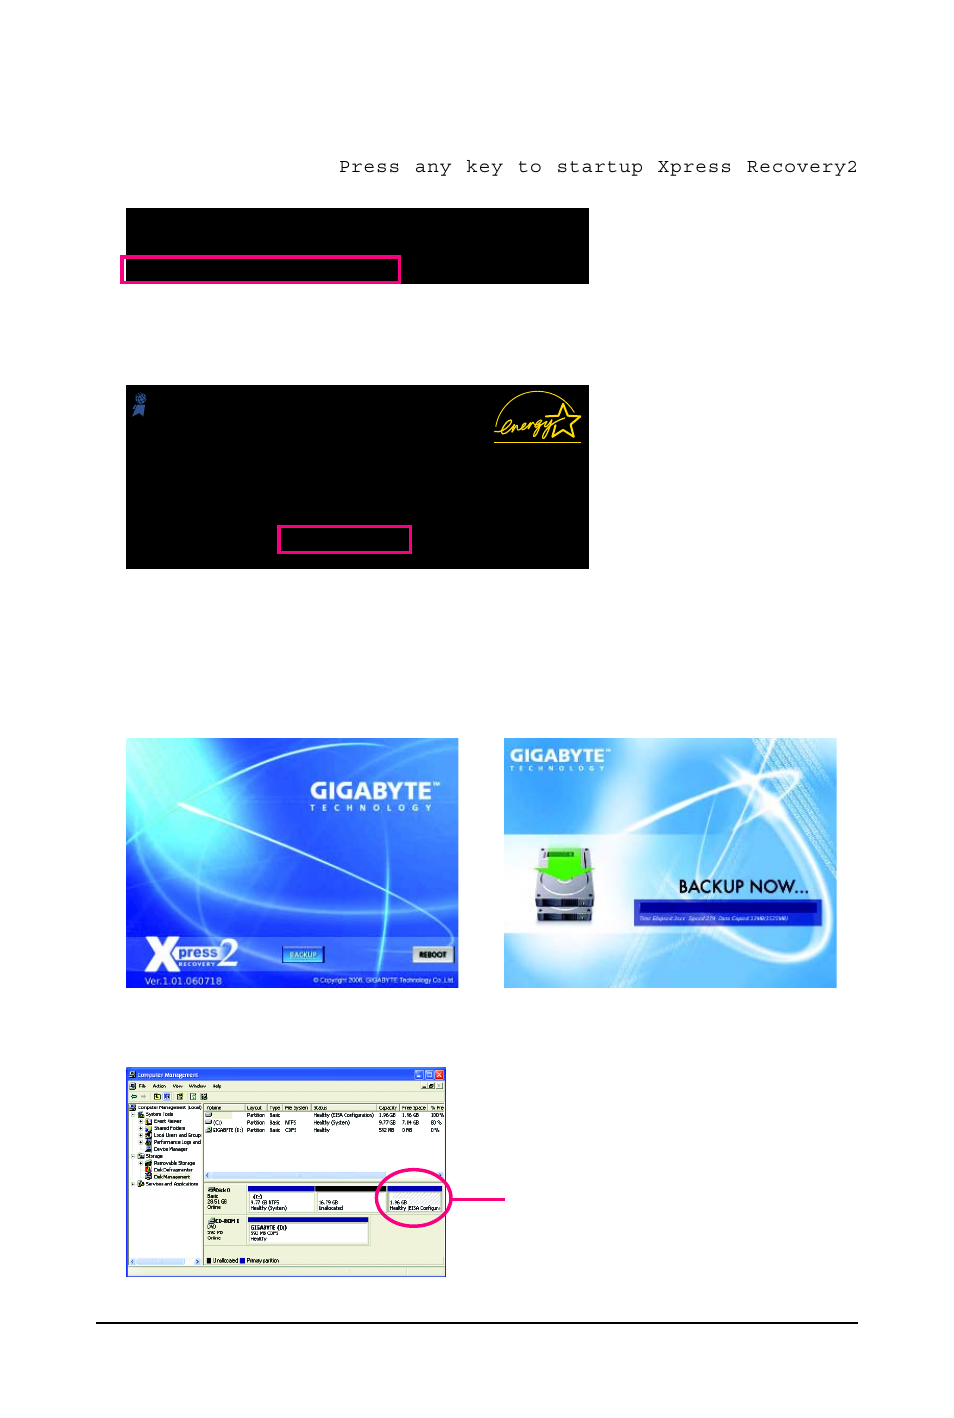 GIGABYTE LGA775 Socket Motherboard for Intel GA-73PVM-S2H